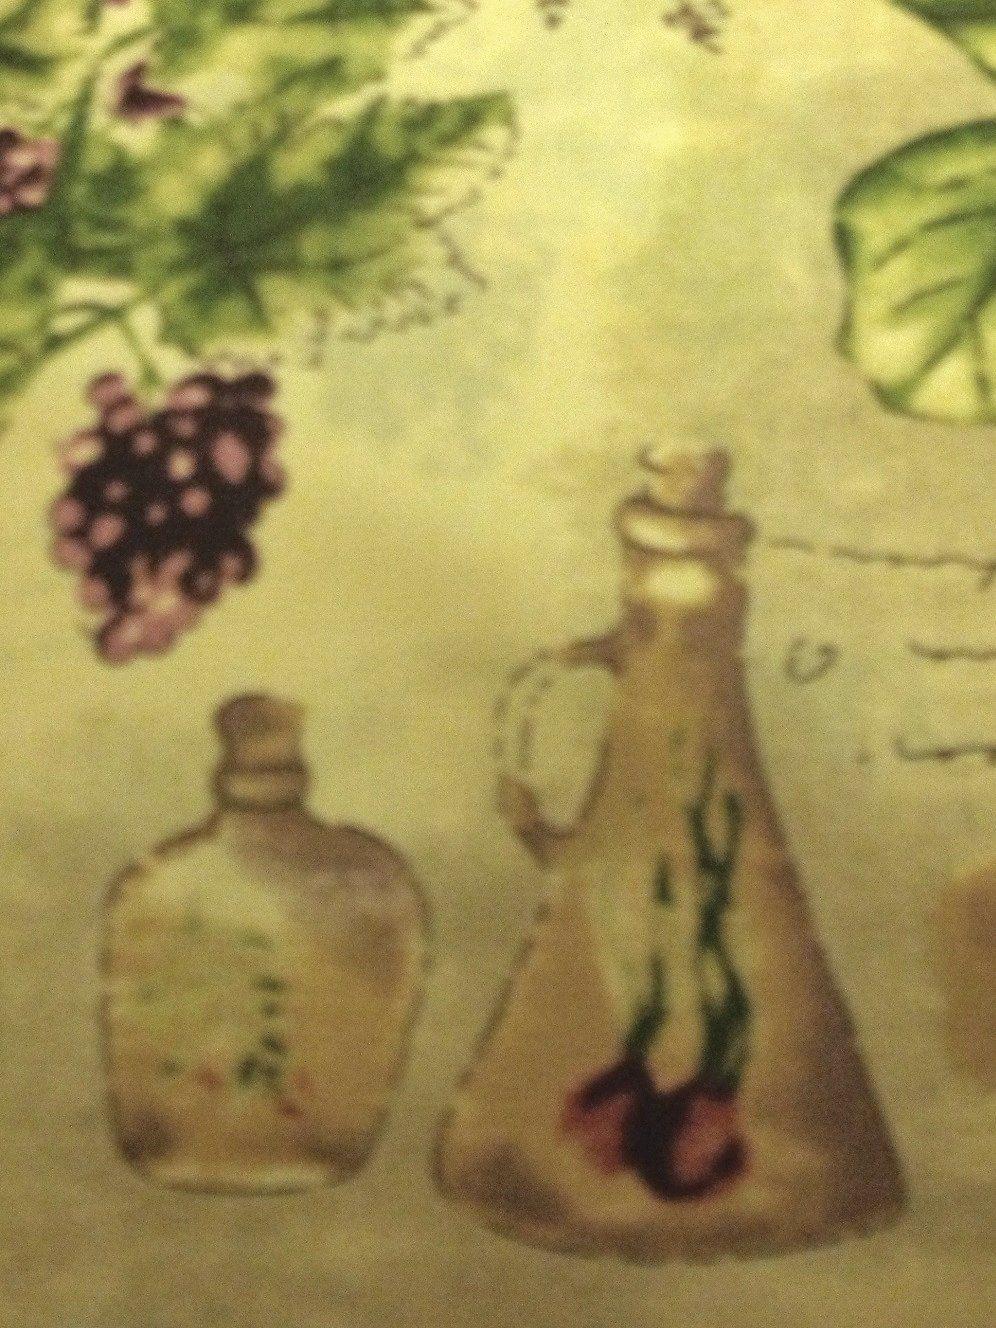 Superb Sorrento+Tuscan+Grapes+Oli Ves+Round+Tablecloth $26.95